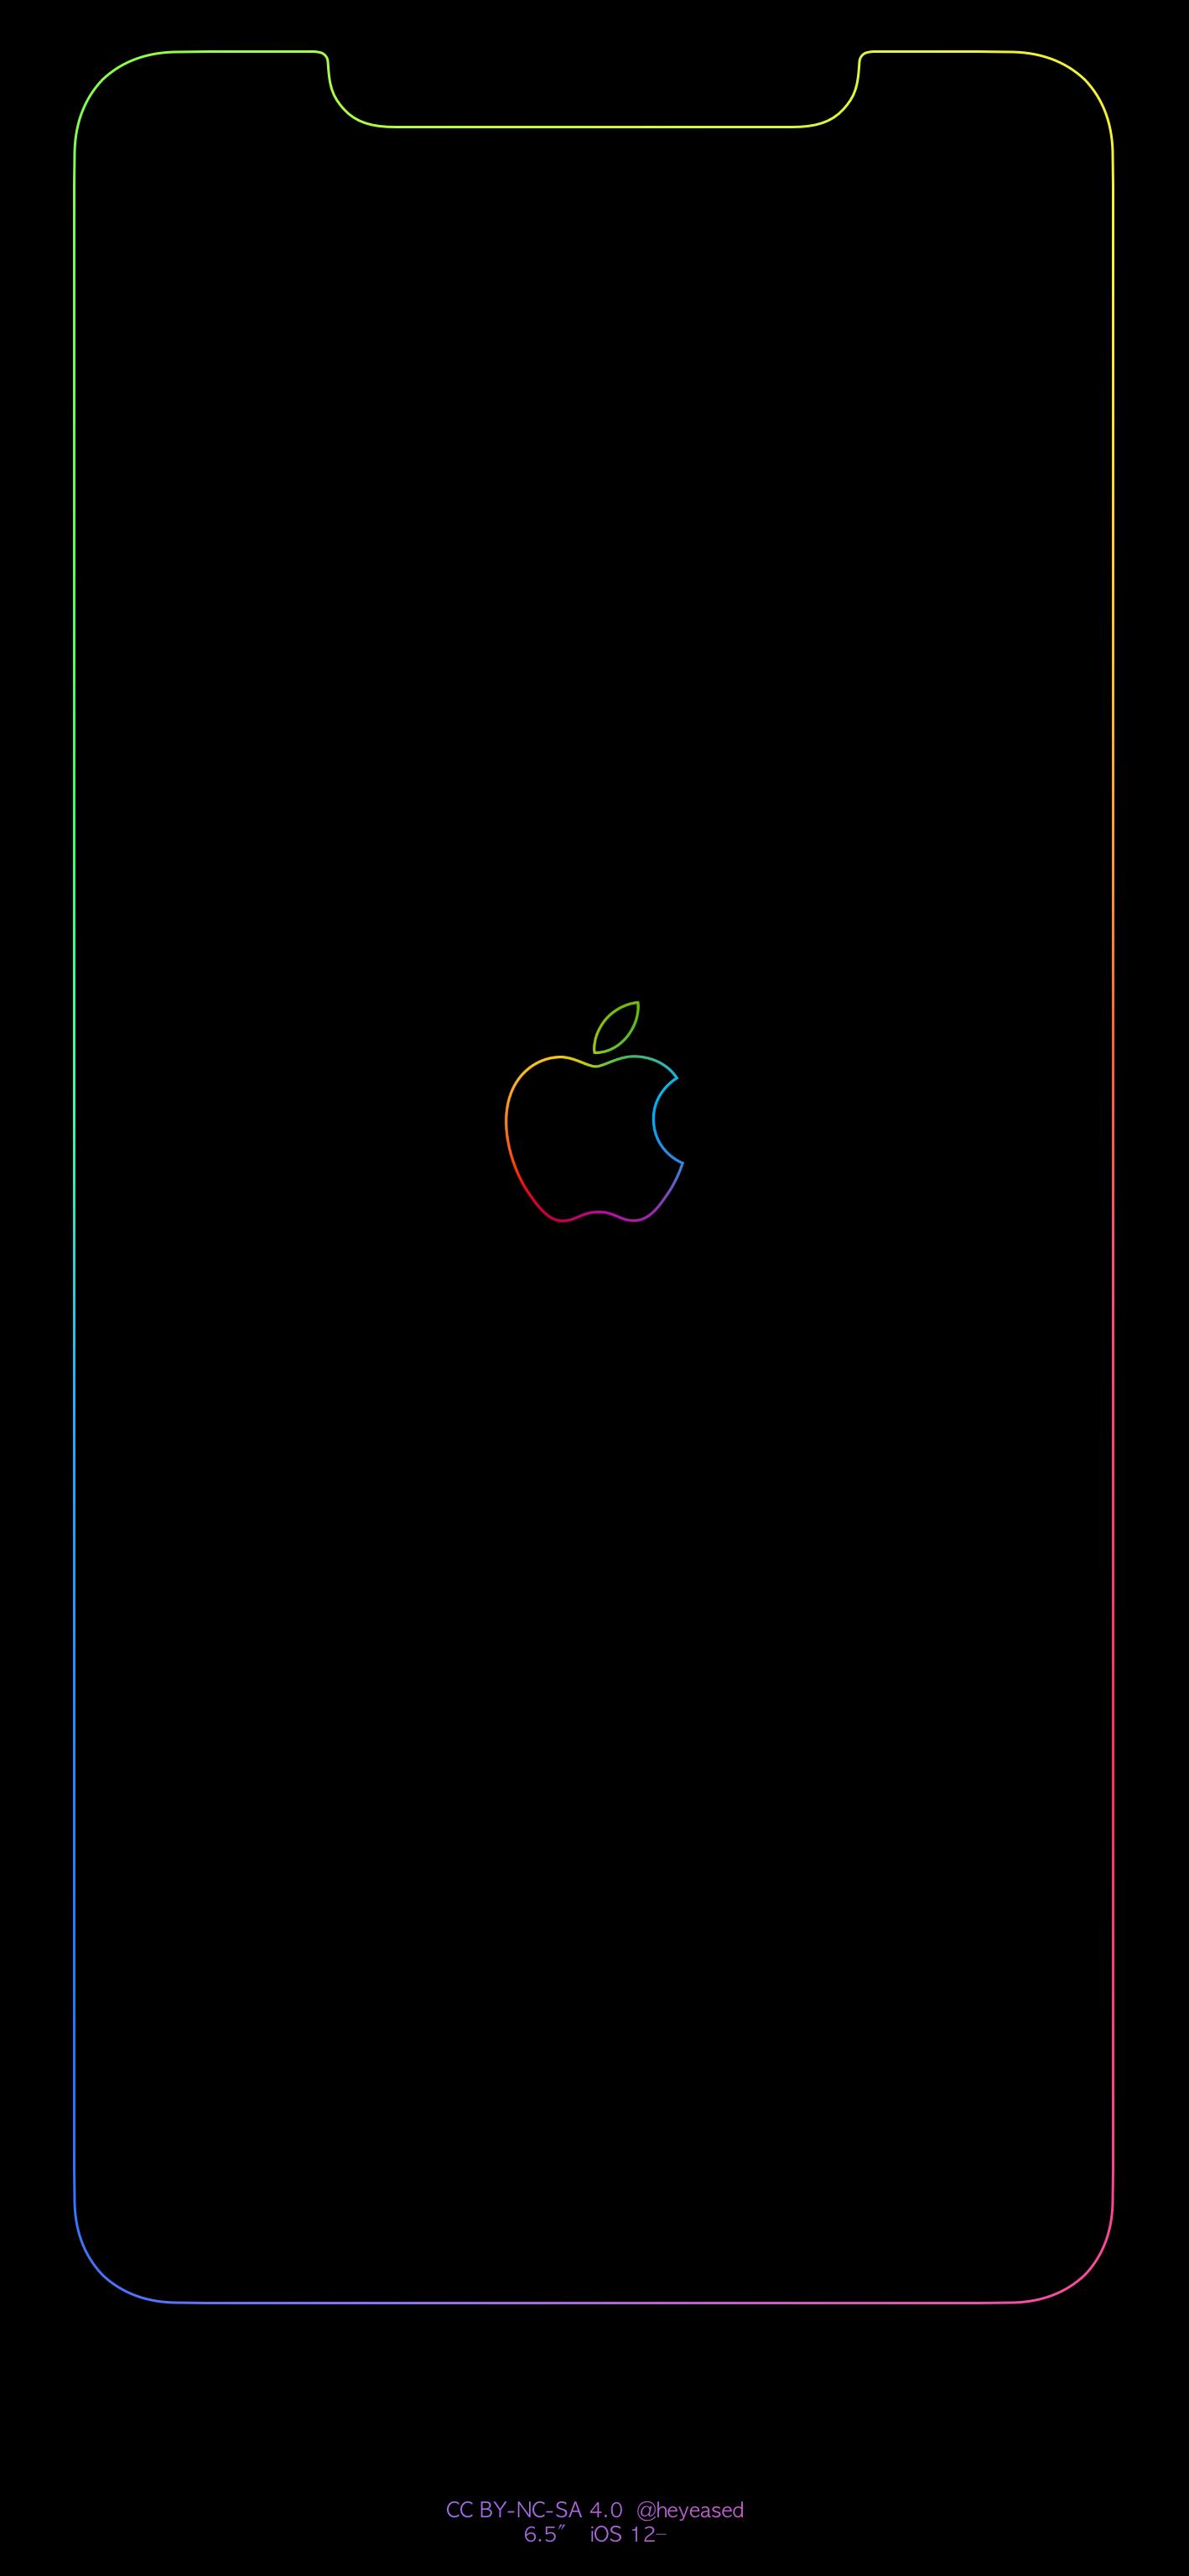 Xs Max Rainbow Border Amp Apple Logohttps I Redd It Wndfr0bj16w11 Png Apple Logo Wallpaper Iphone Apple Iphone Wallpaper Hd Iphone Wallpaper Ios